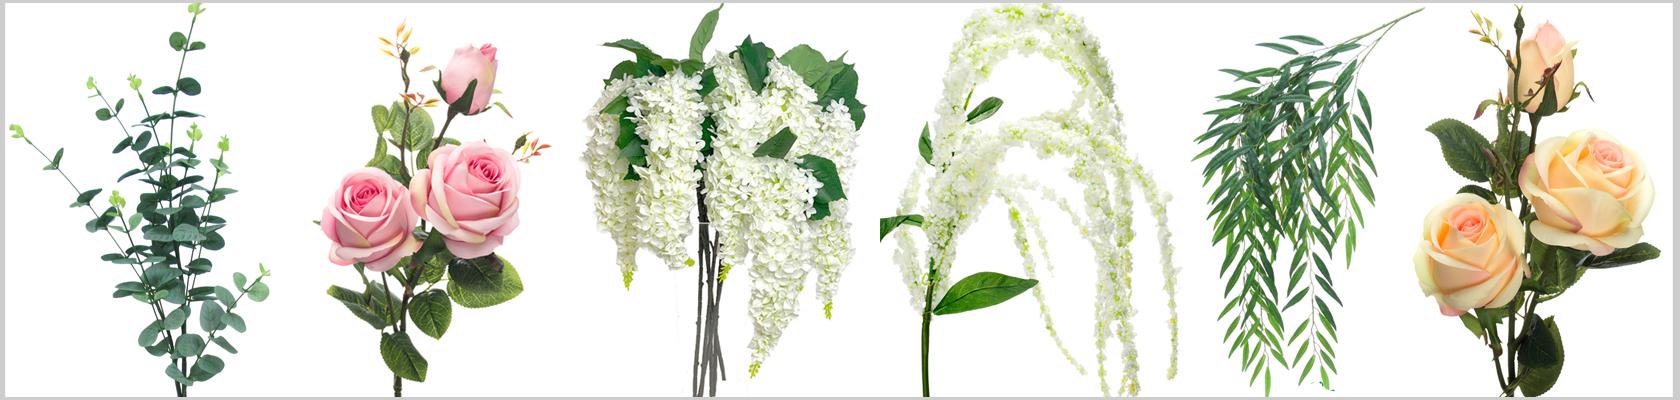 Artificial Floral Sprays & Picks - ShopWildThings